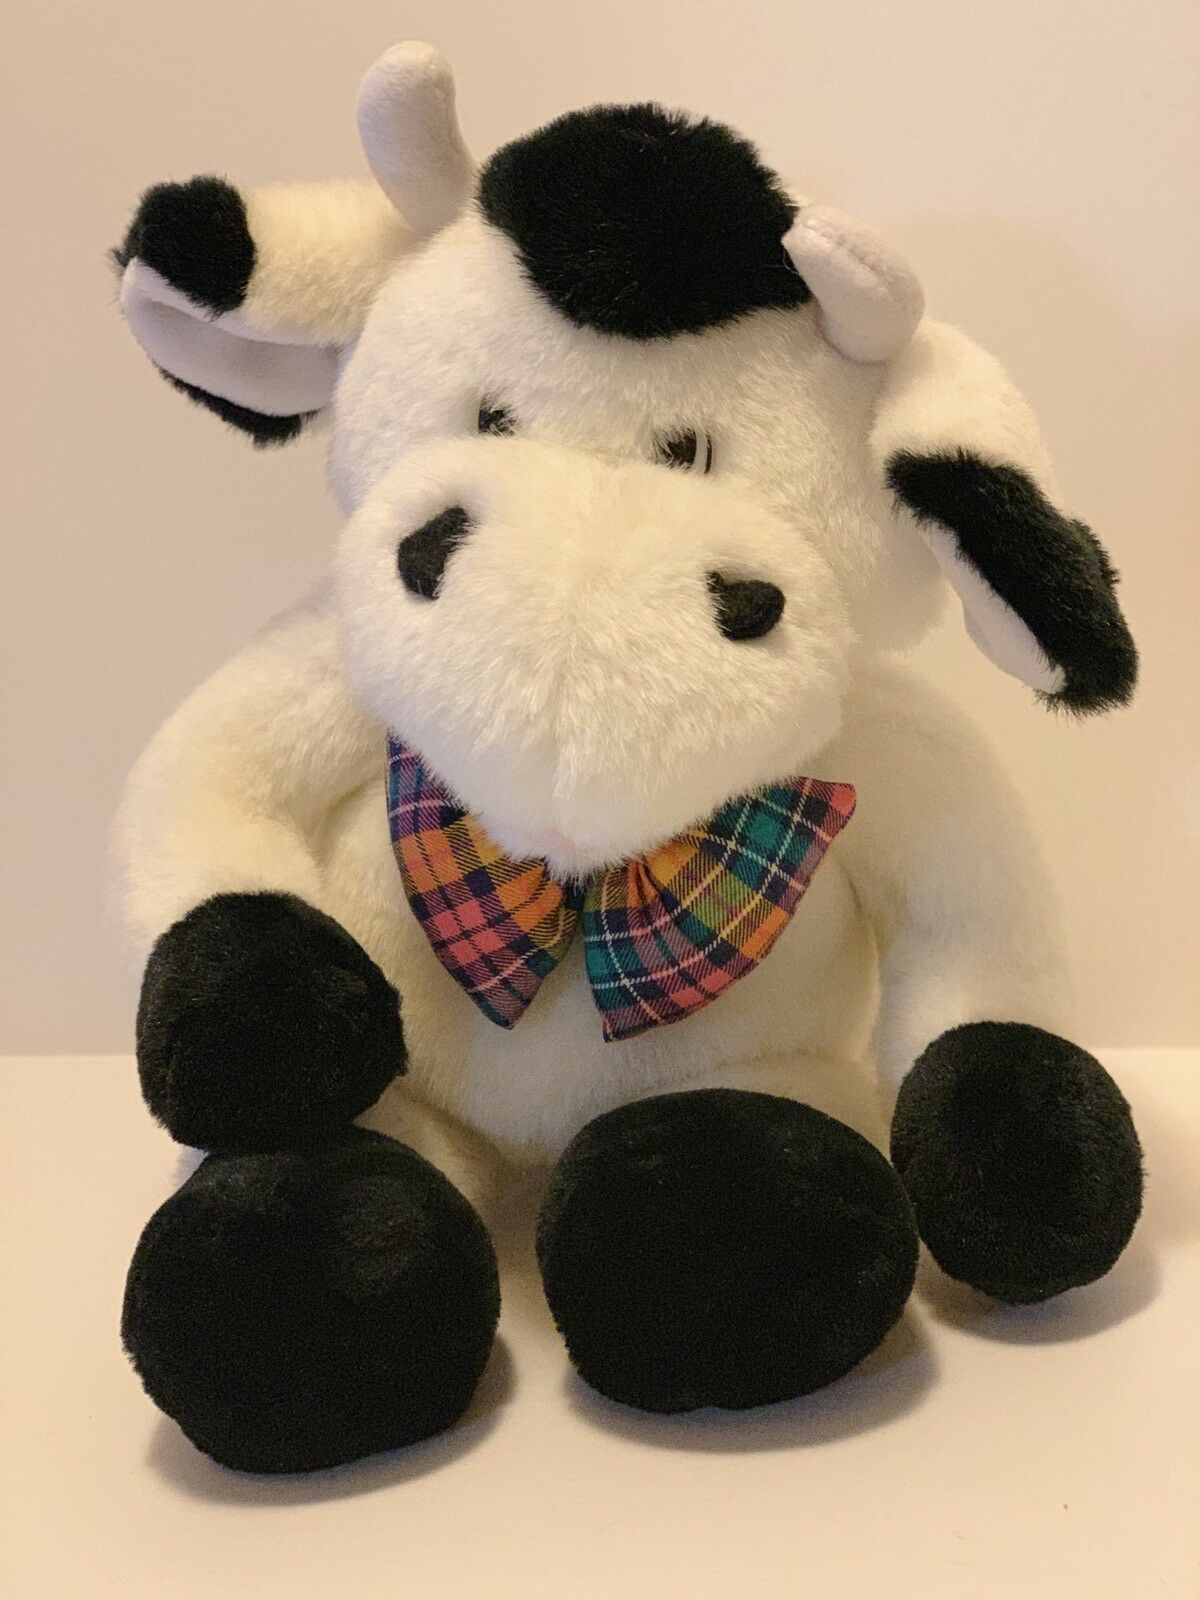 "Commonwealth Plush Cow Black White Stuffed Animal Plaid Bow Tie Soft 14"" Toy image 7"